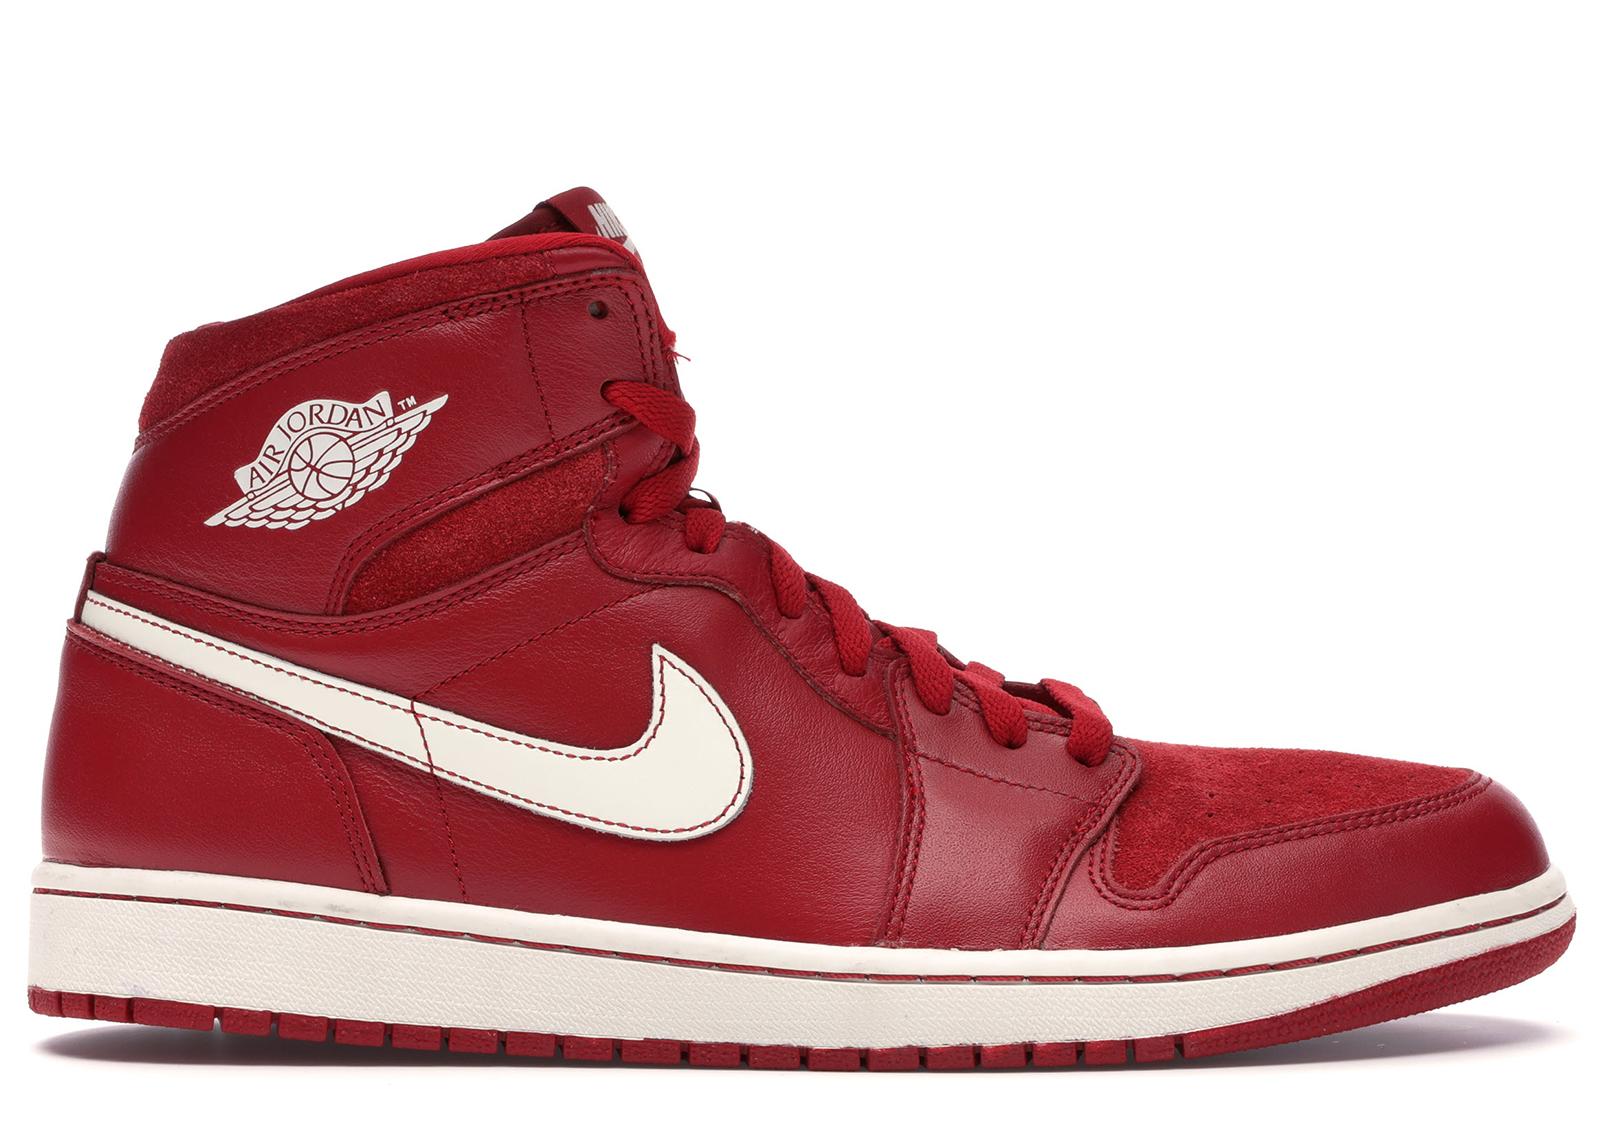 Jordan 1 Retro Gym Red - 555088-601